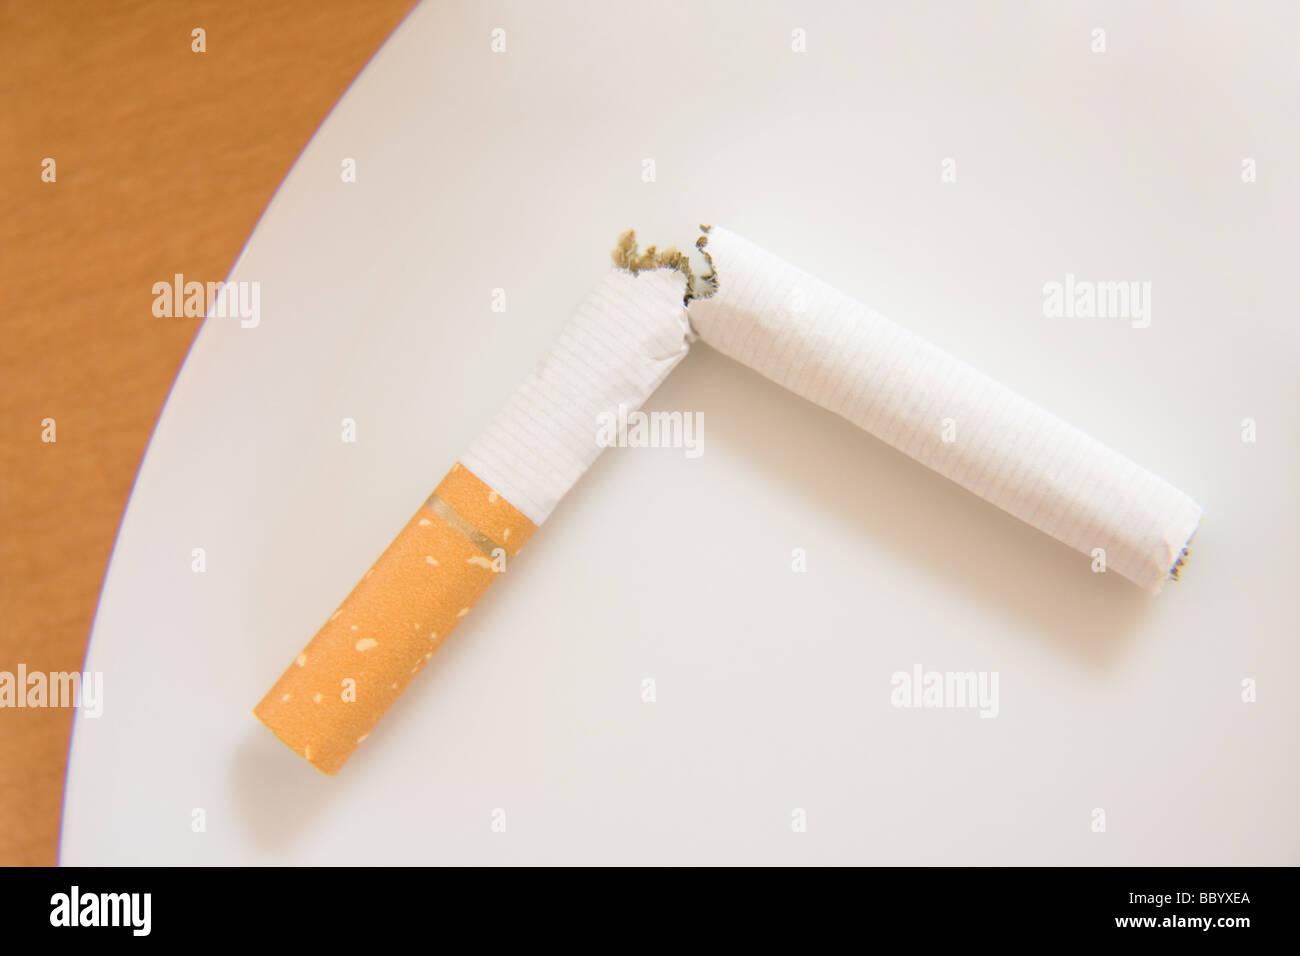 To break the habit of smoking - Stock Image